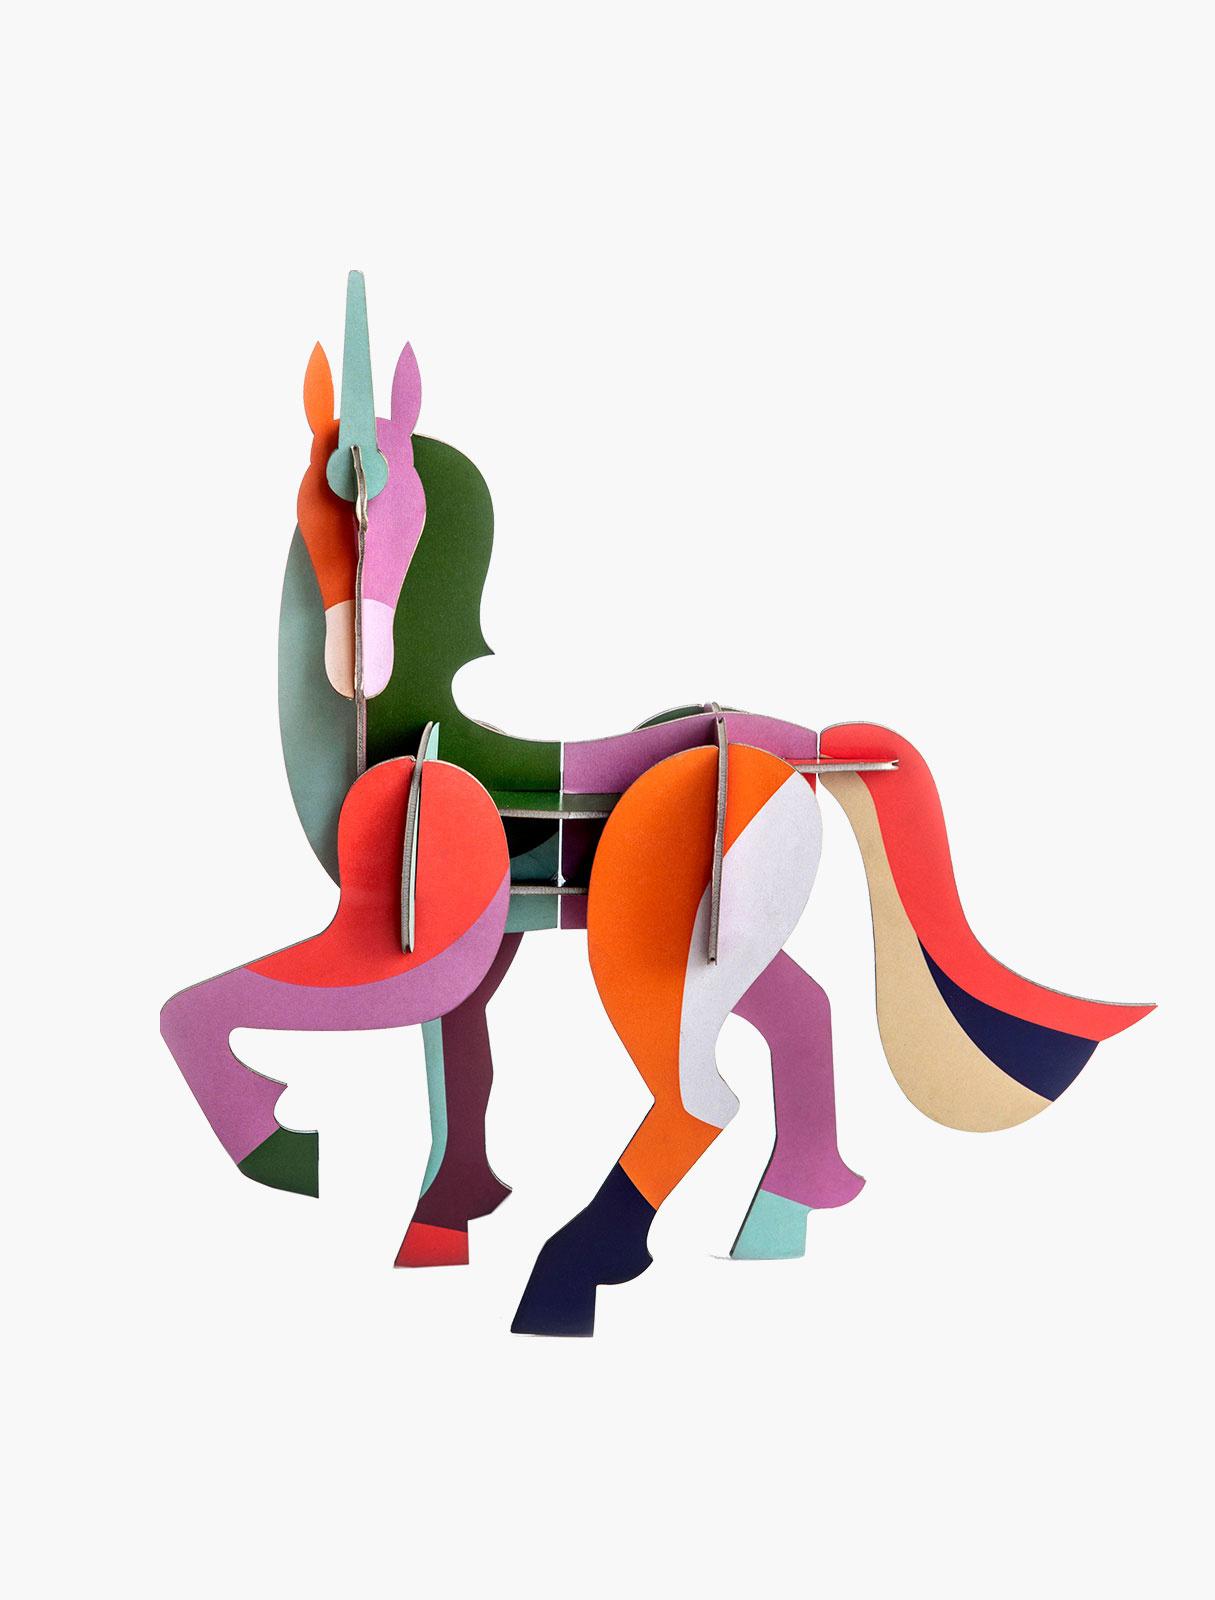 Studio Roof Construction kit Totem Giant Unicorn